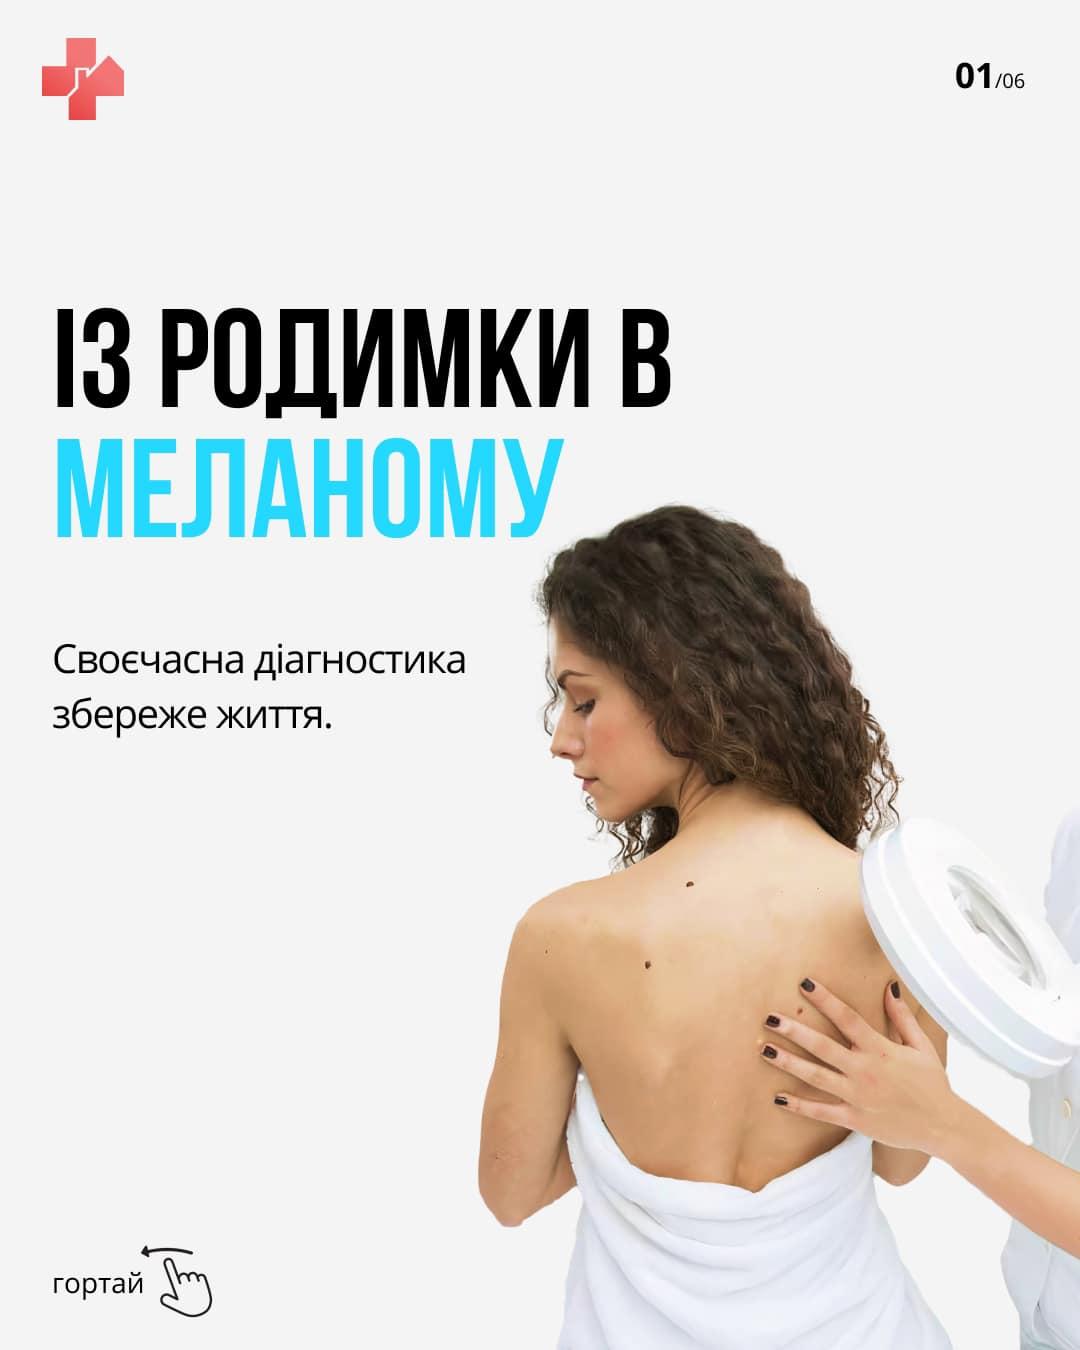 врач-дерматовенеролог